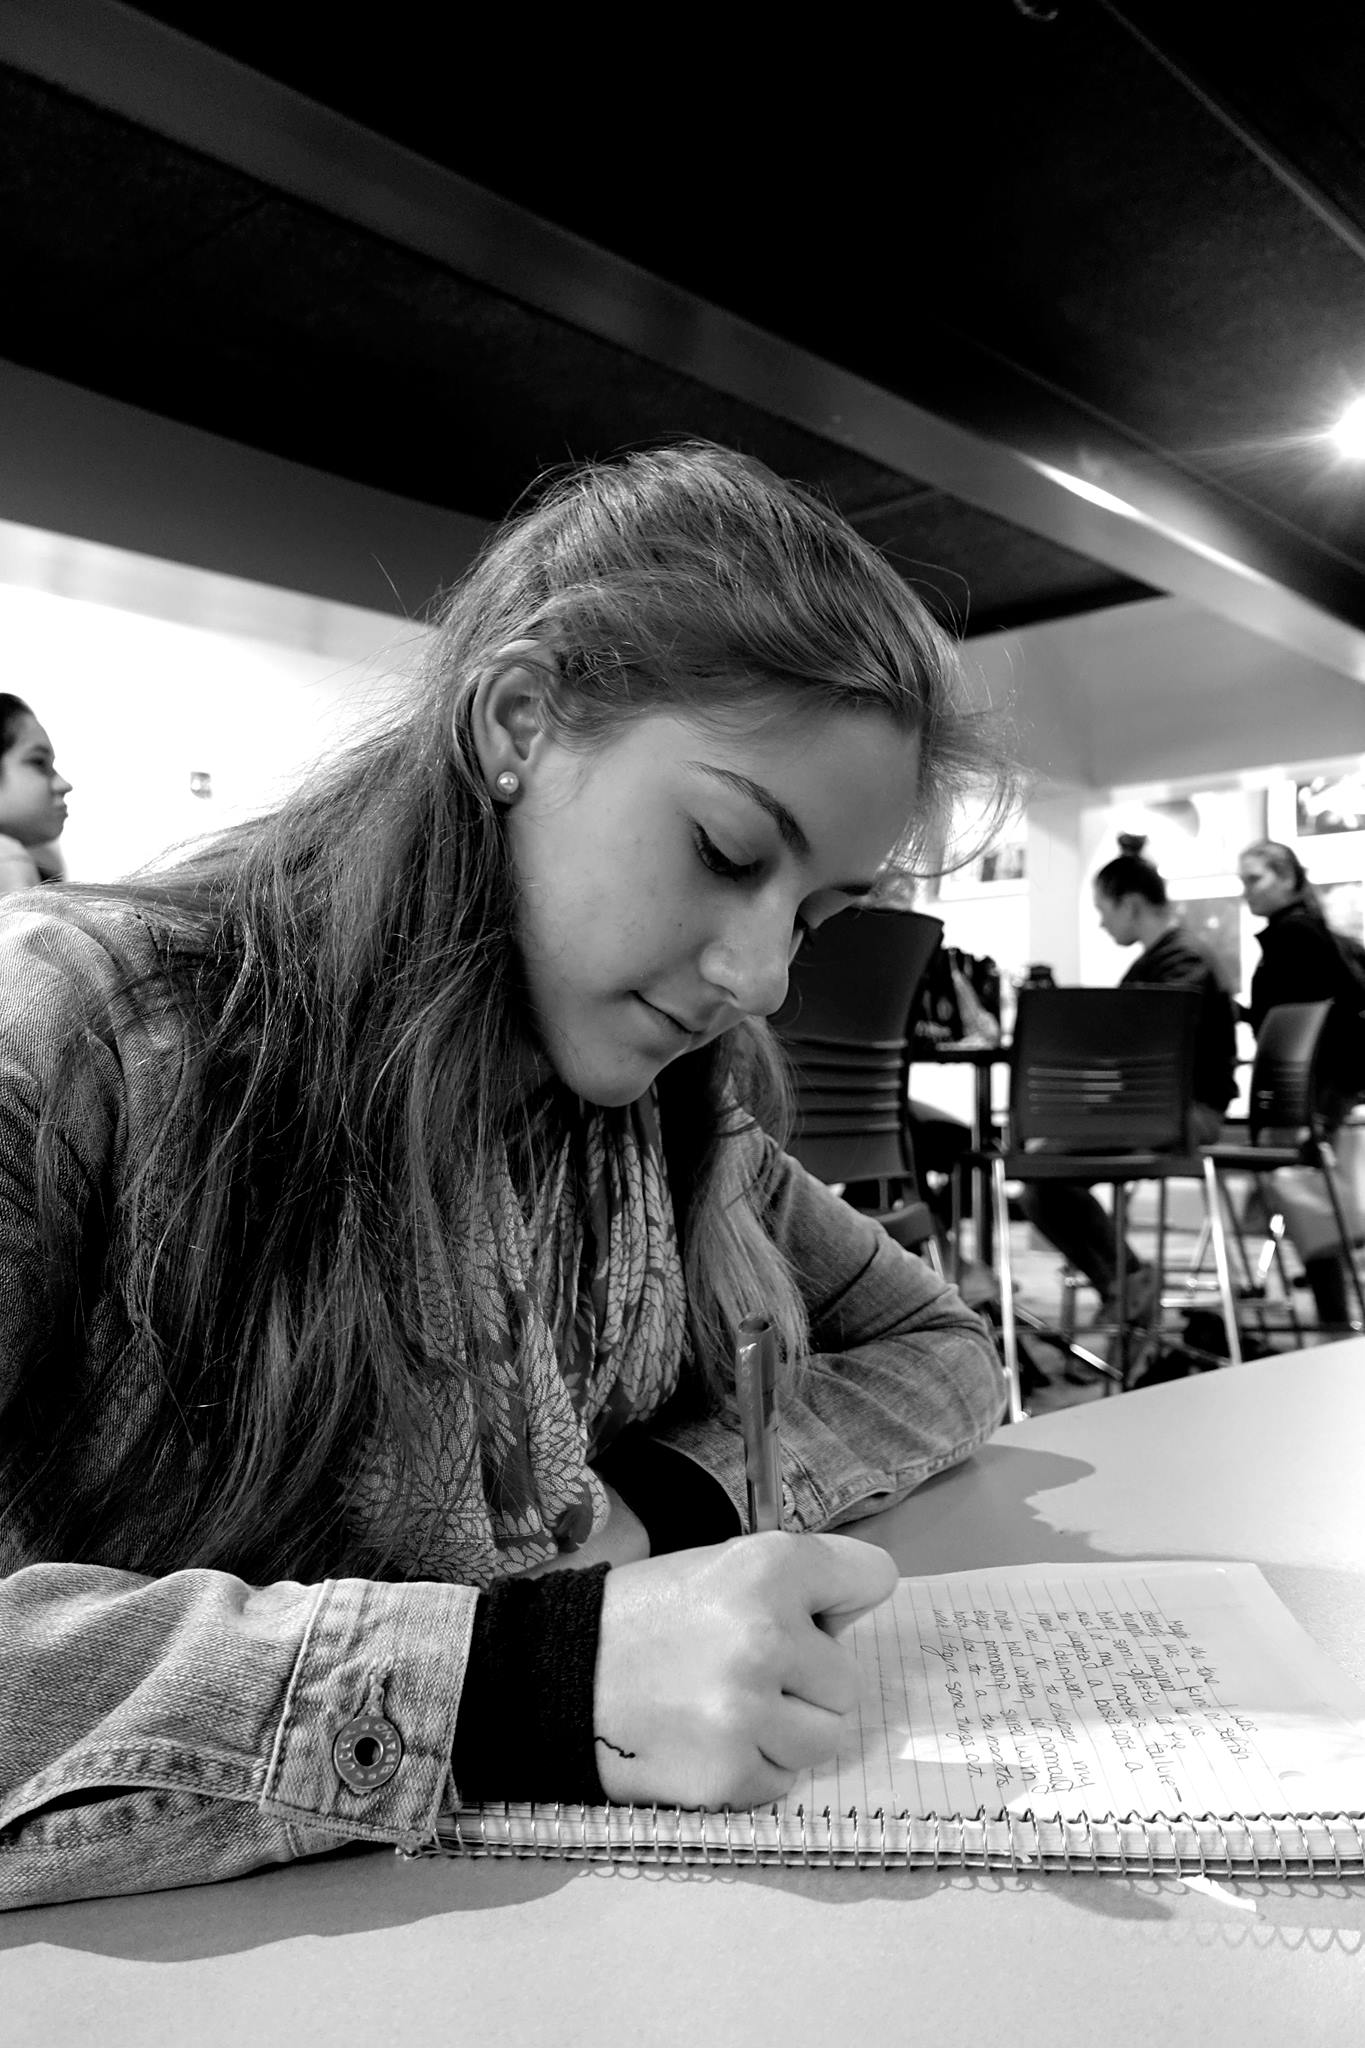 BRAINSTORM Senior Caroline Bailey jots down ideas for her science-fiction novel.